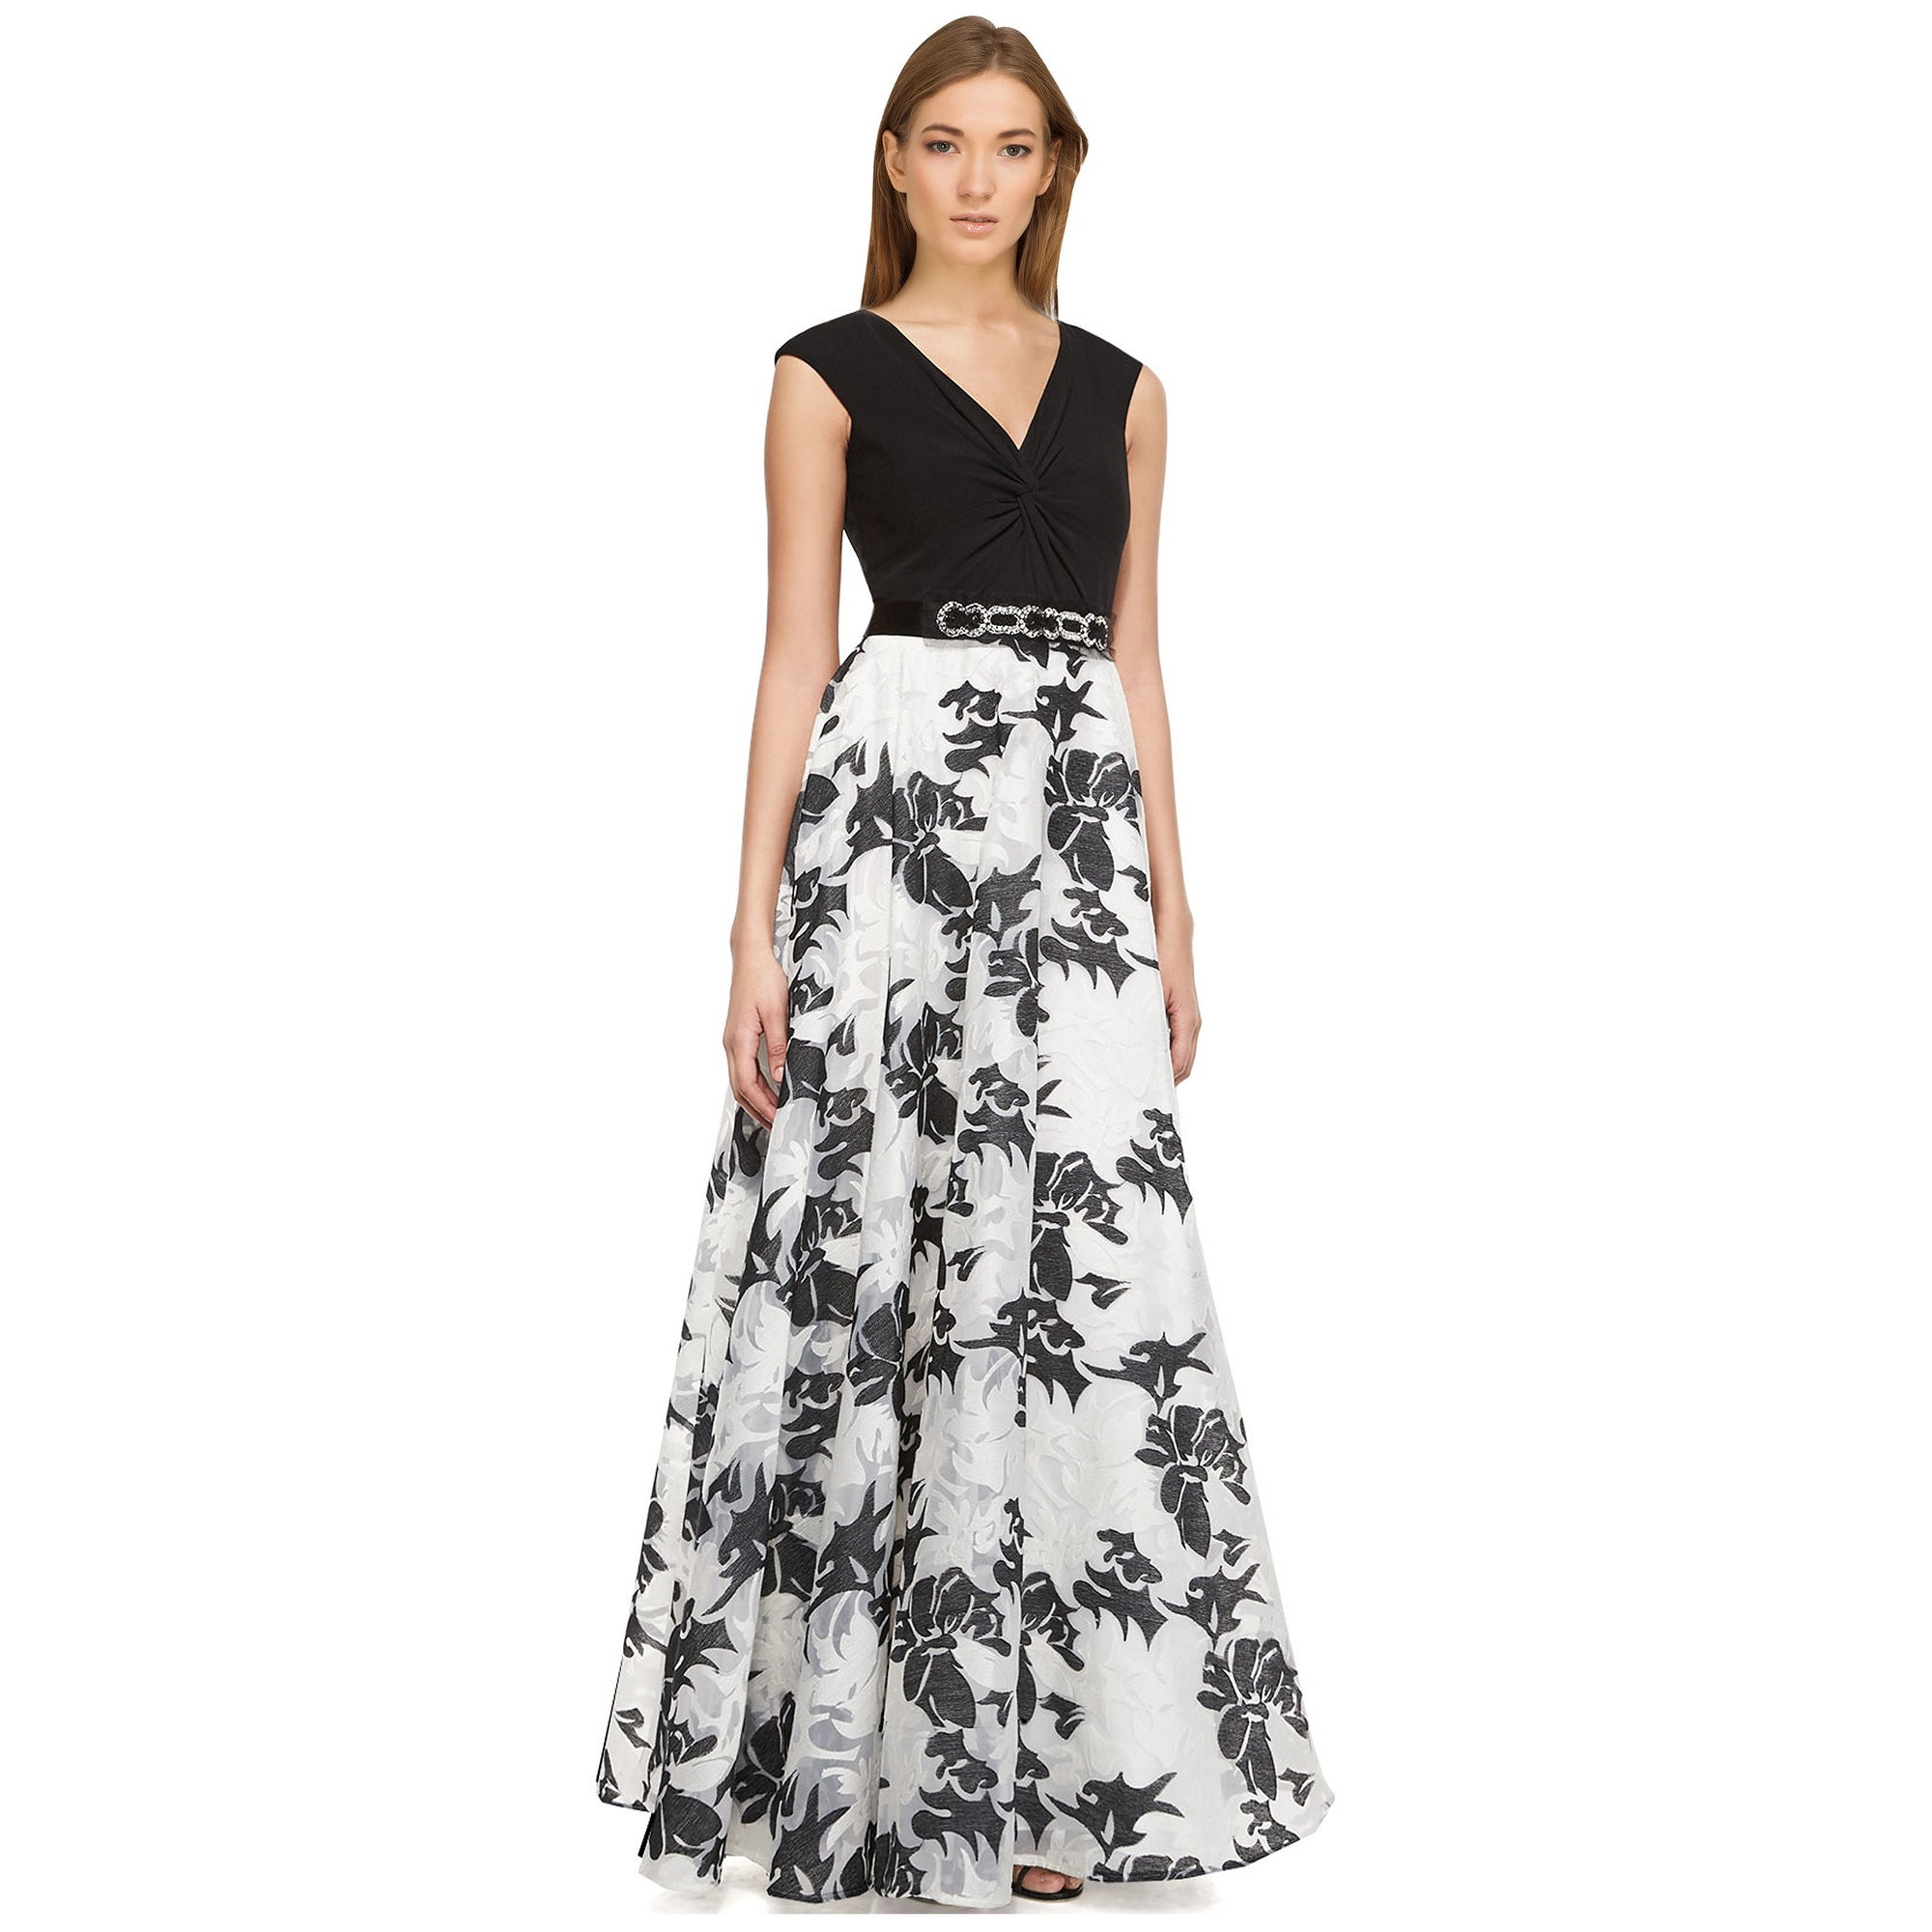 Shop Teri Jon Floral Sleeveless V-Neck Evening Gown Dress - 12 ...